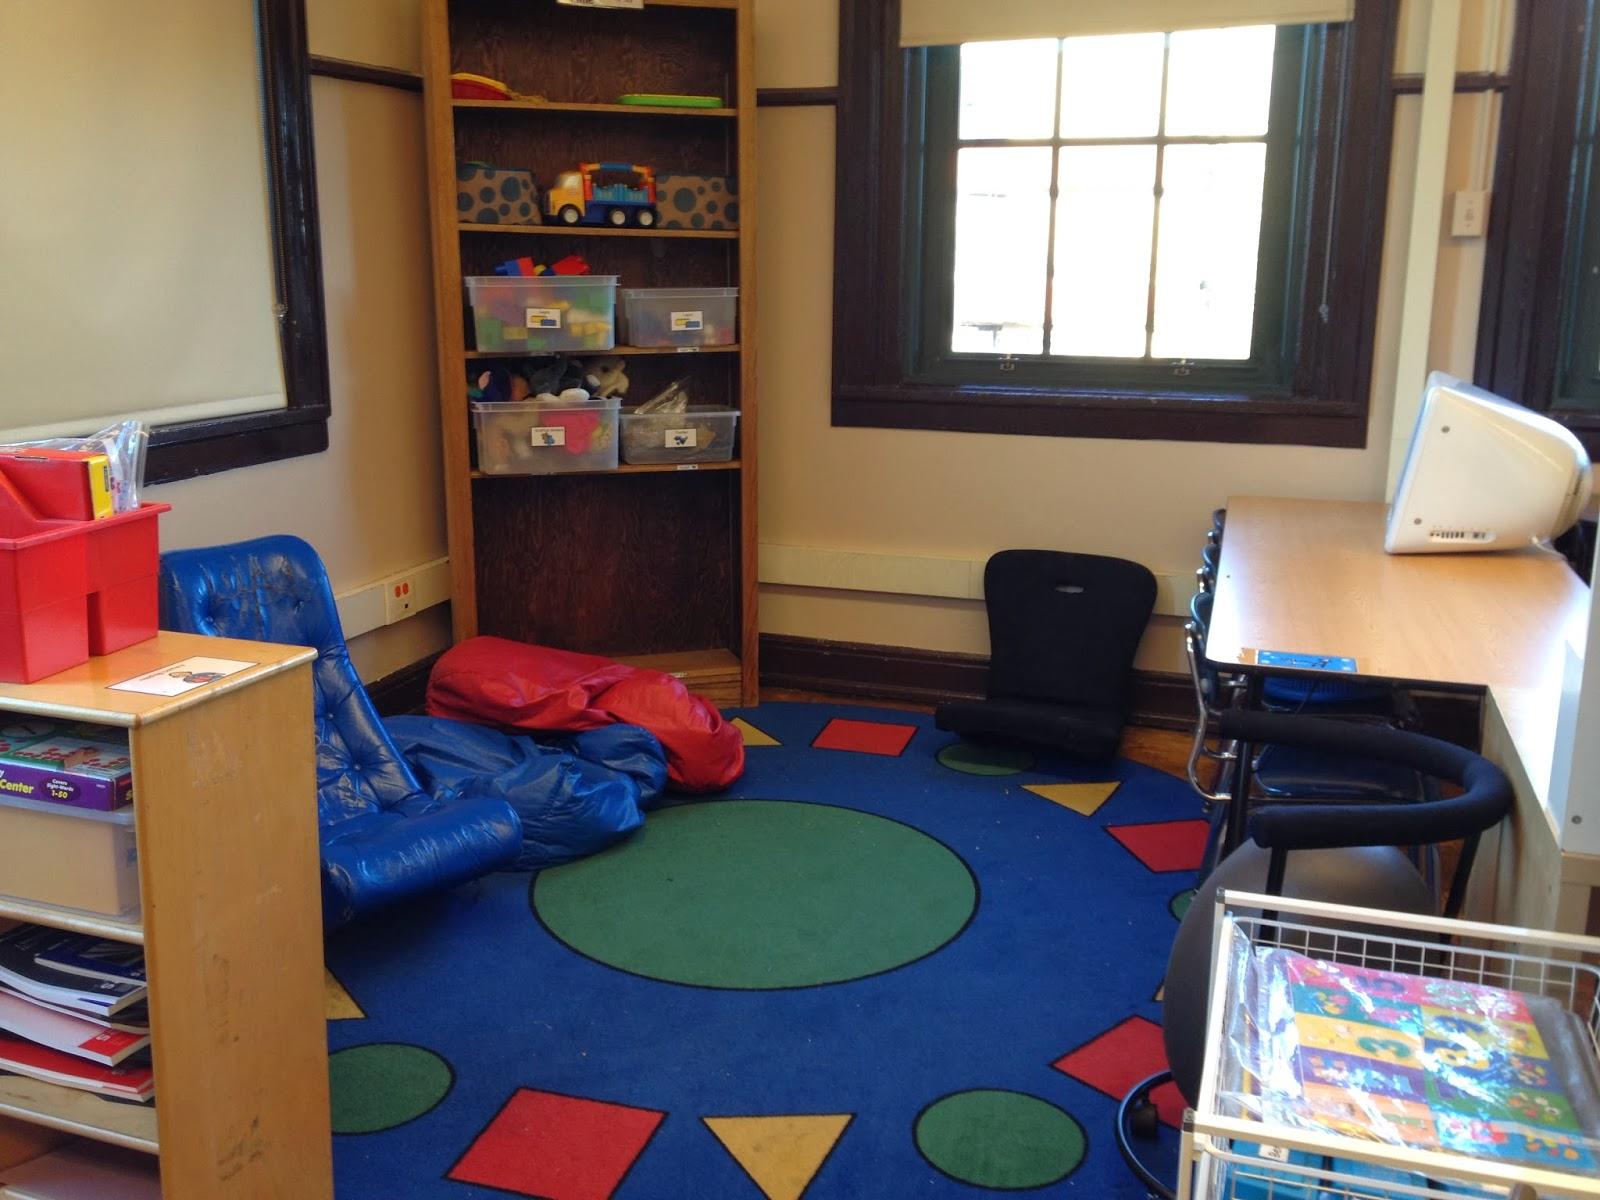 Classroom Ideas For Autistic Students ~ Autism tank classroom tour break area